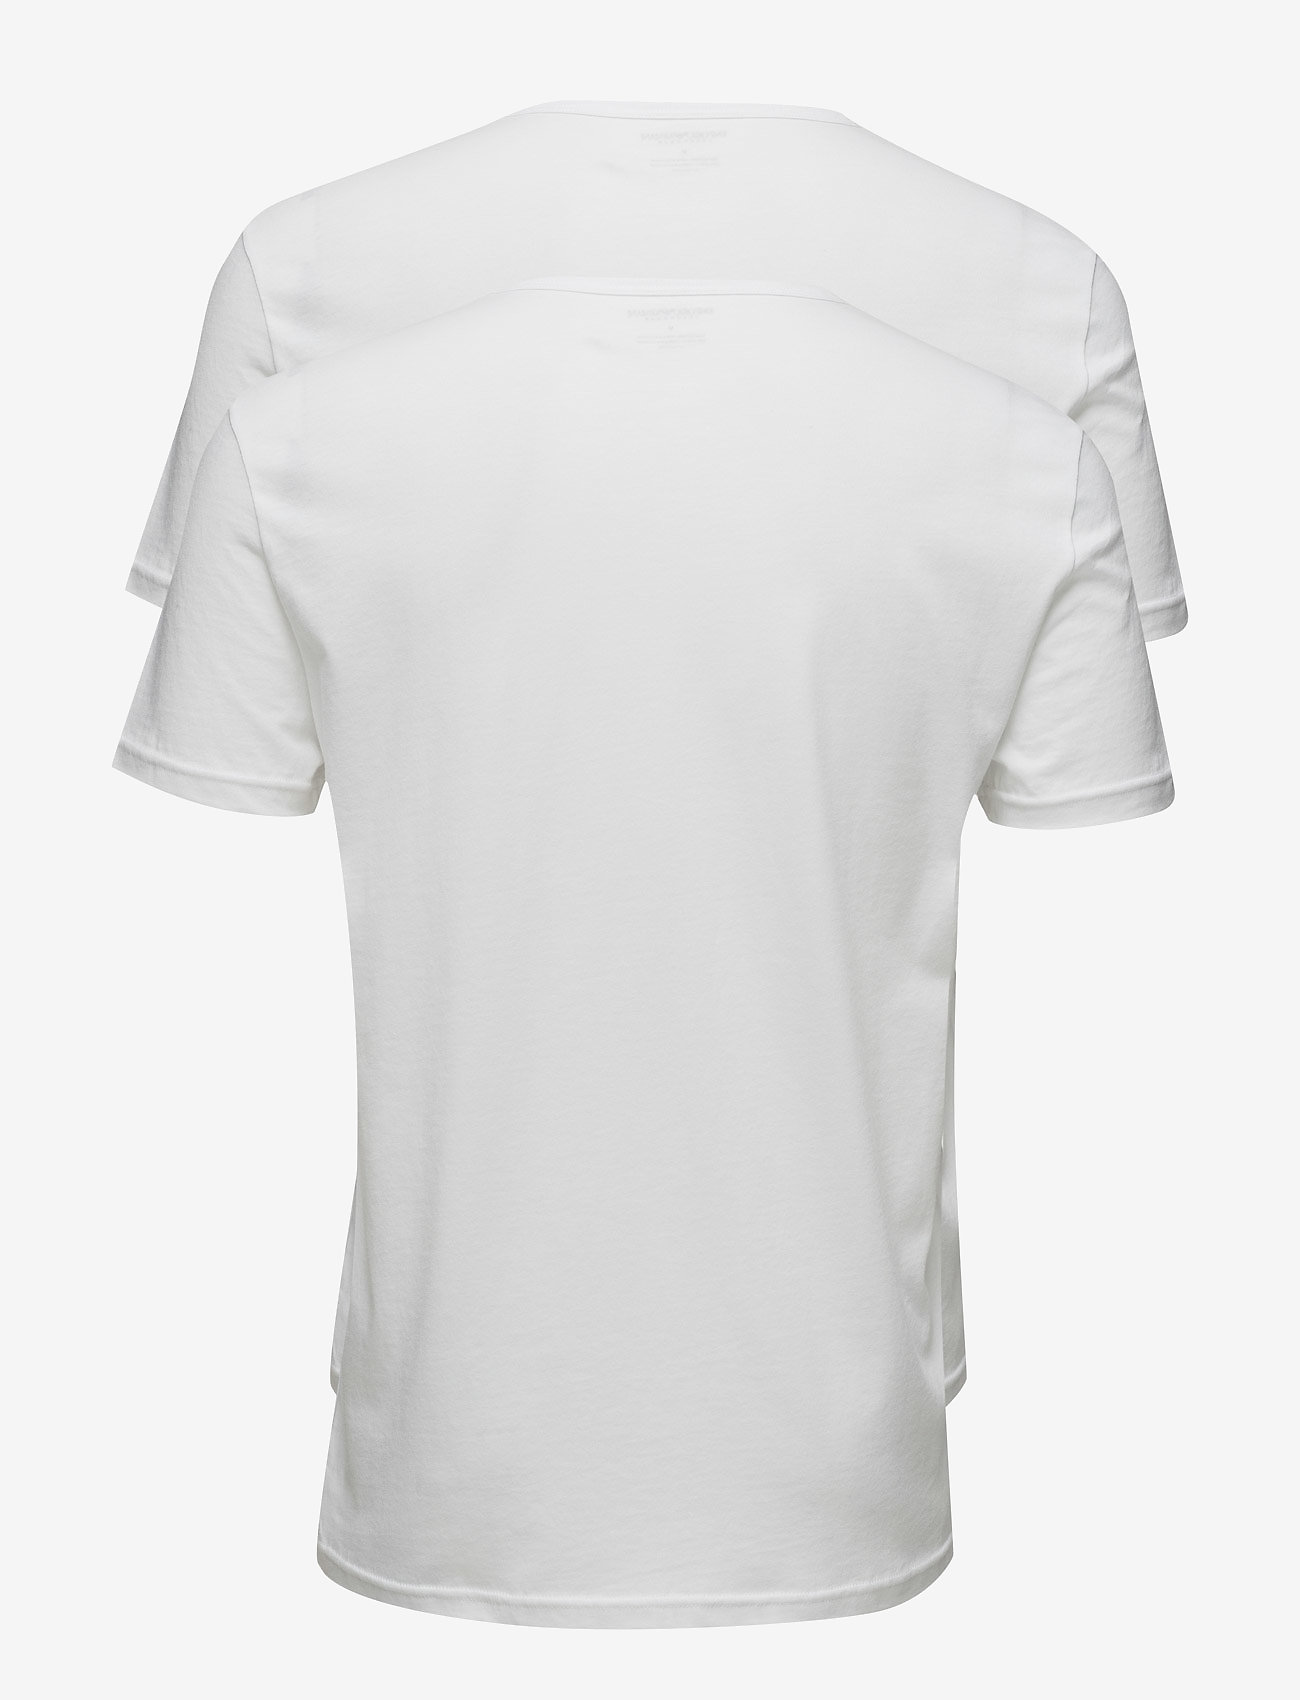 Emporio Armani - MENS KNIT 2PACK TSH - multipack - bianco/bianco - 1